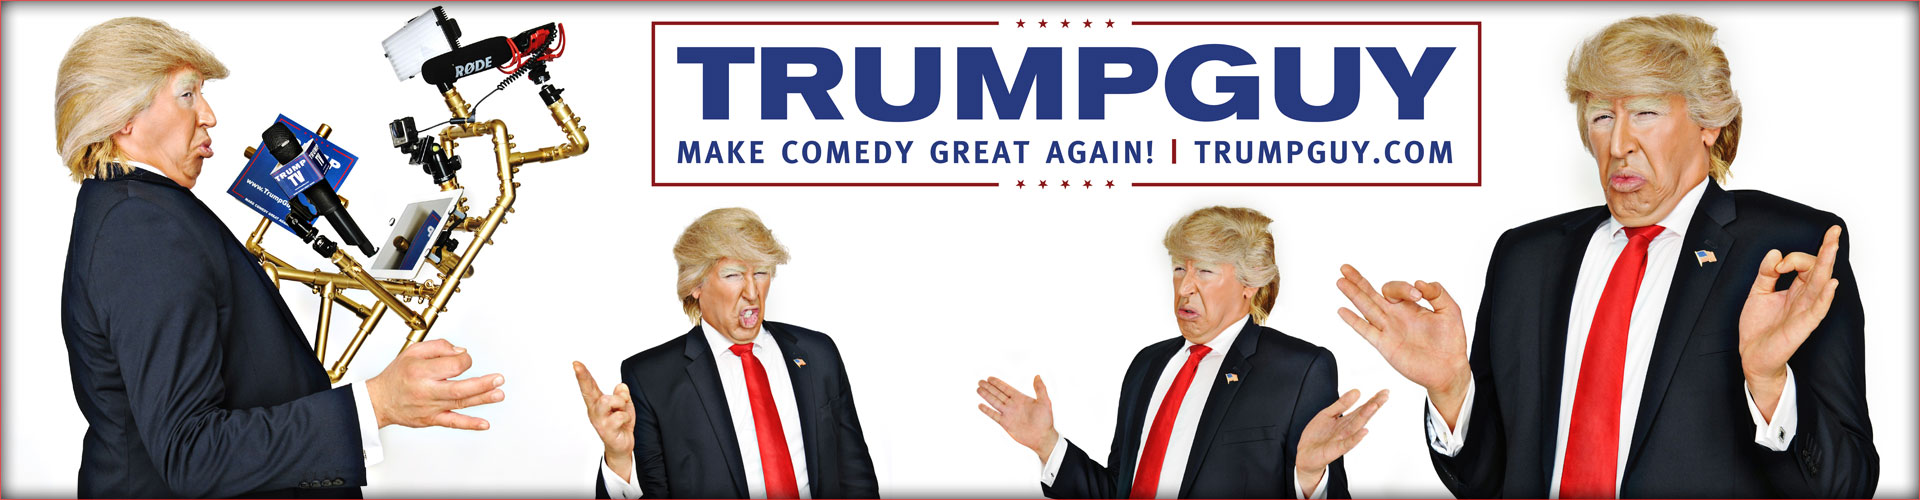 trumpguy-banner.jpg